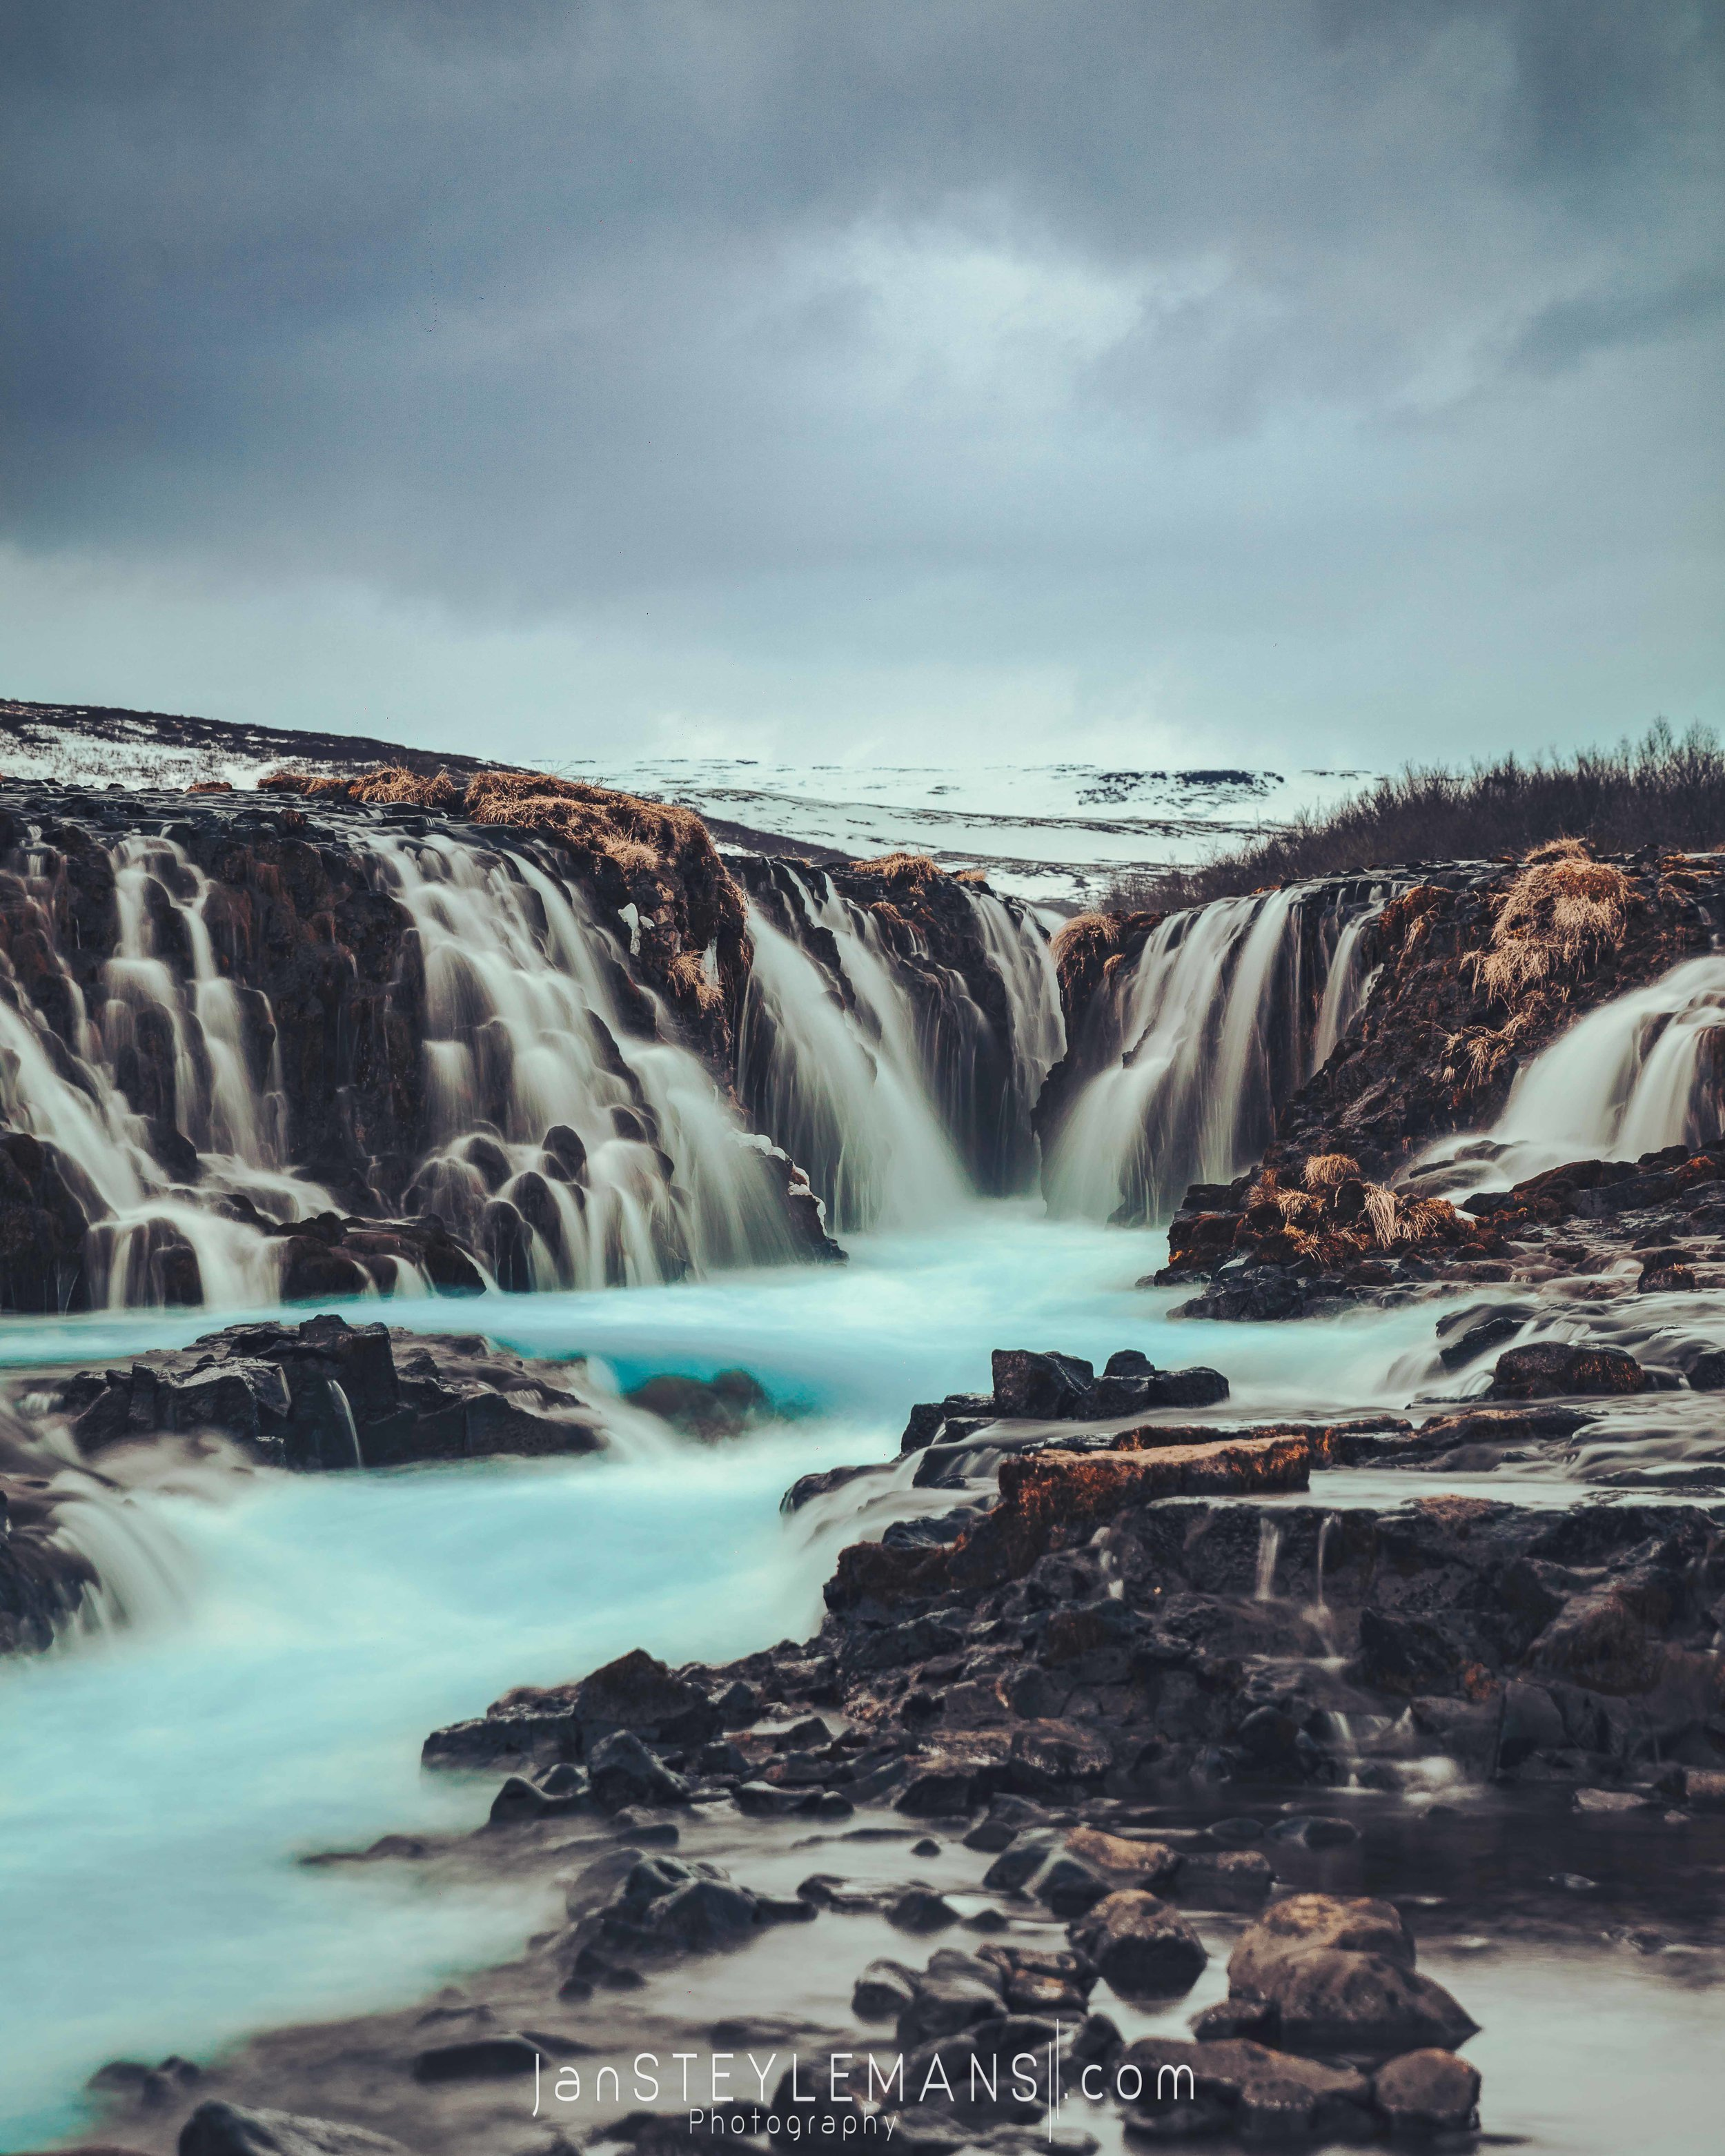 56. Bruarfoss, Iceland